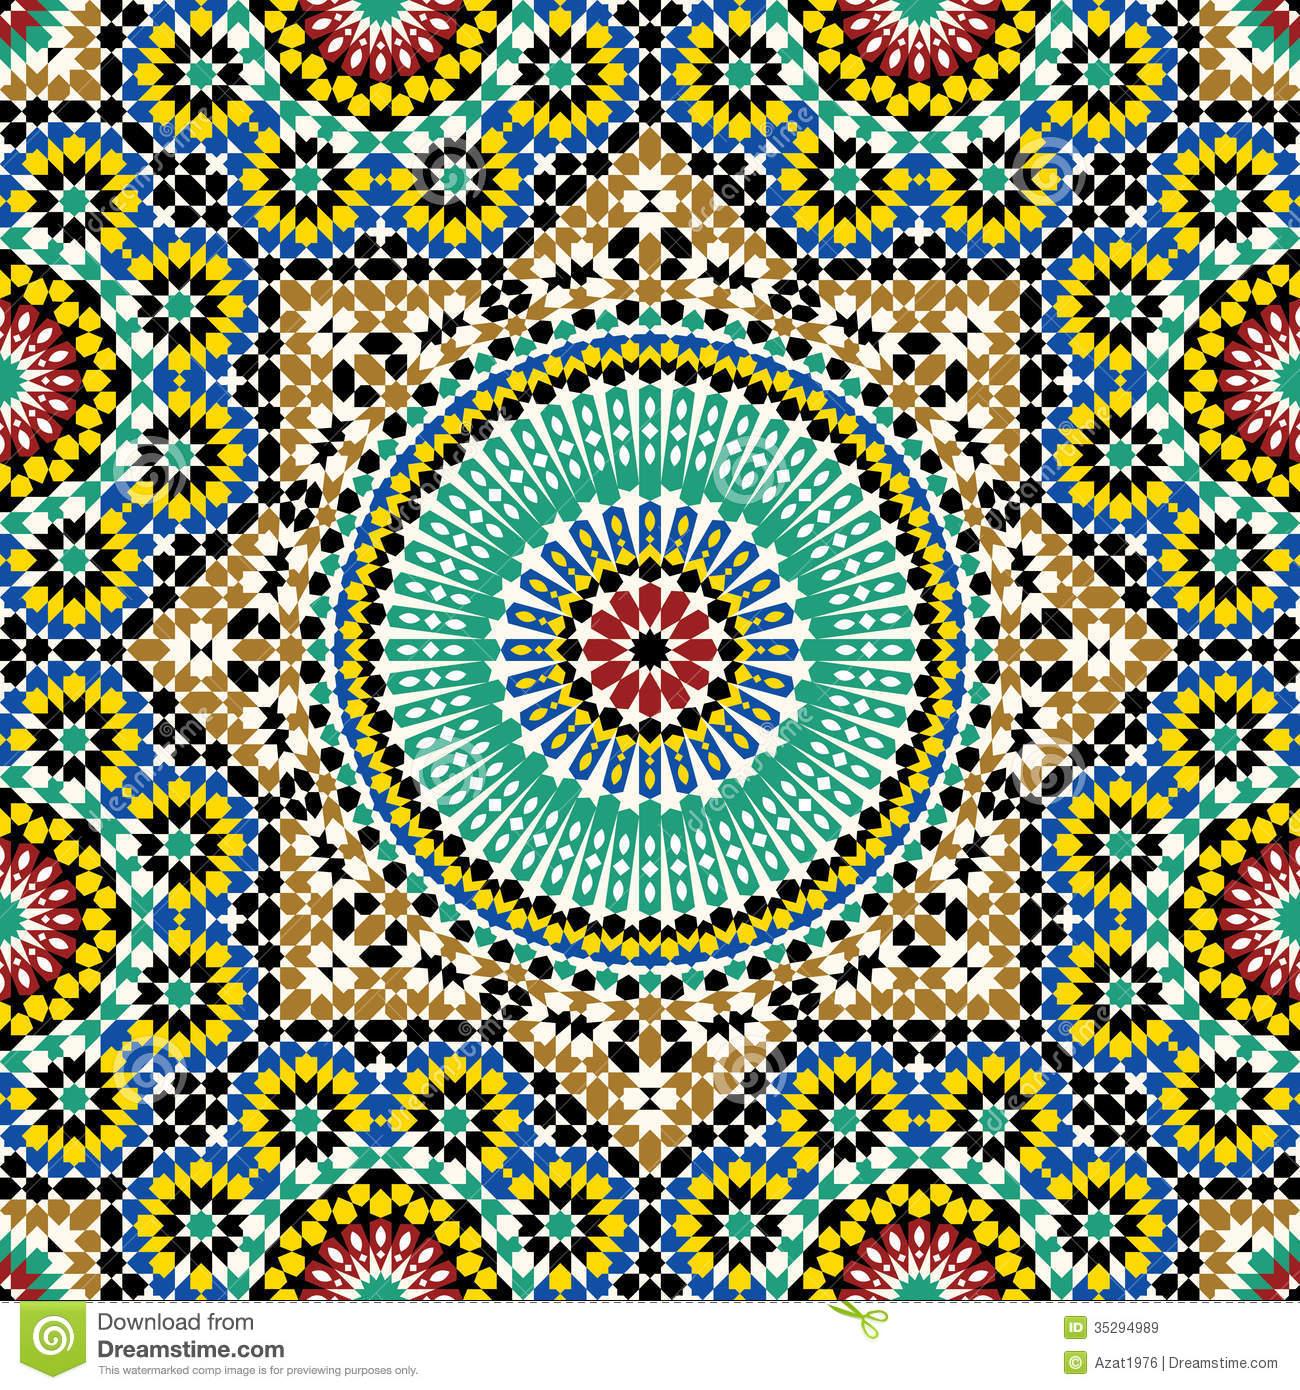 16 Moroccan Graphic Design Images Moroccan Print Designs